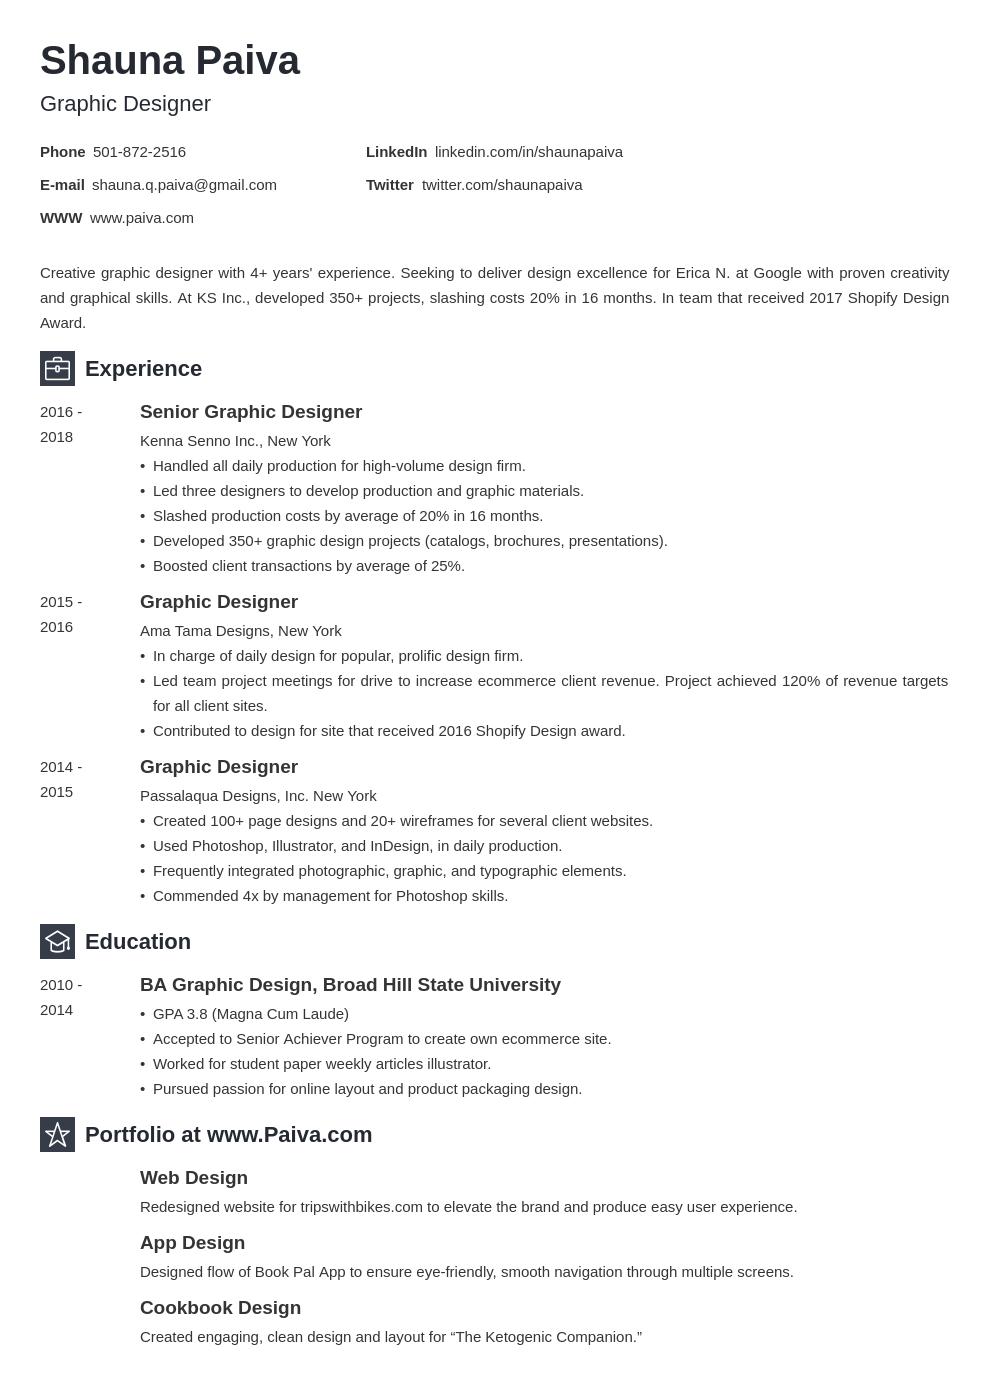 resume look template newcast uk